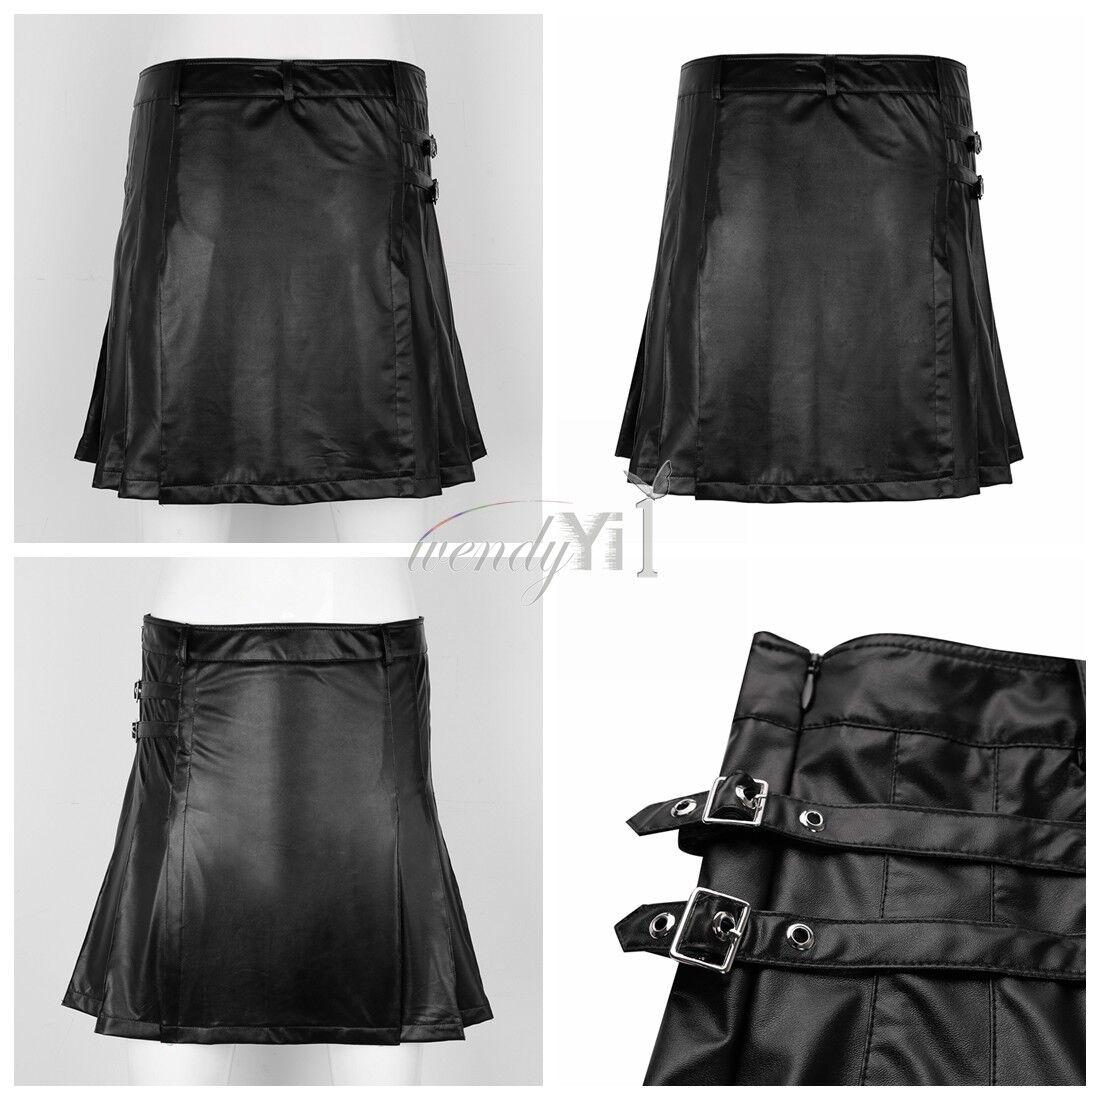 Vintage Men's Leather Straps Sport Utility Kilt Gladiator Pleated Split M-XL